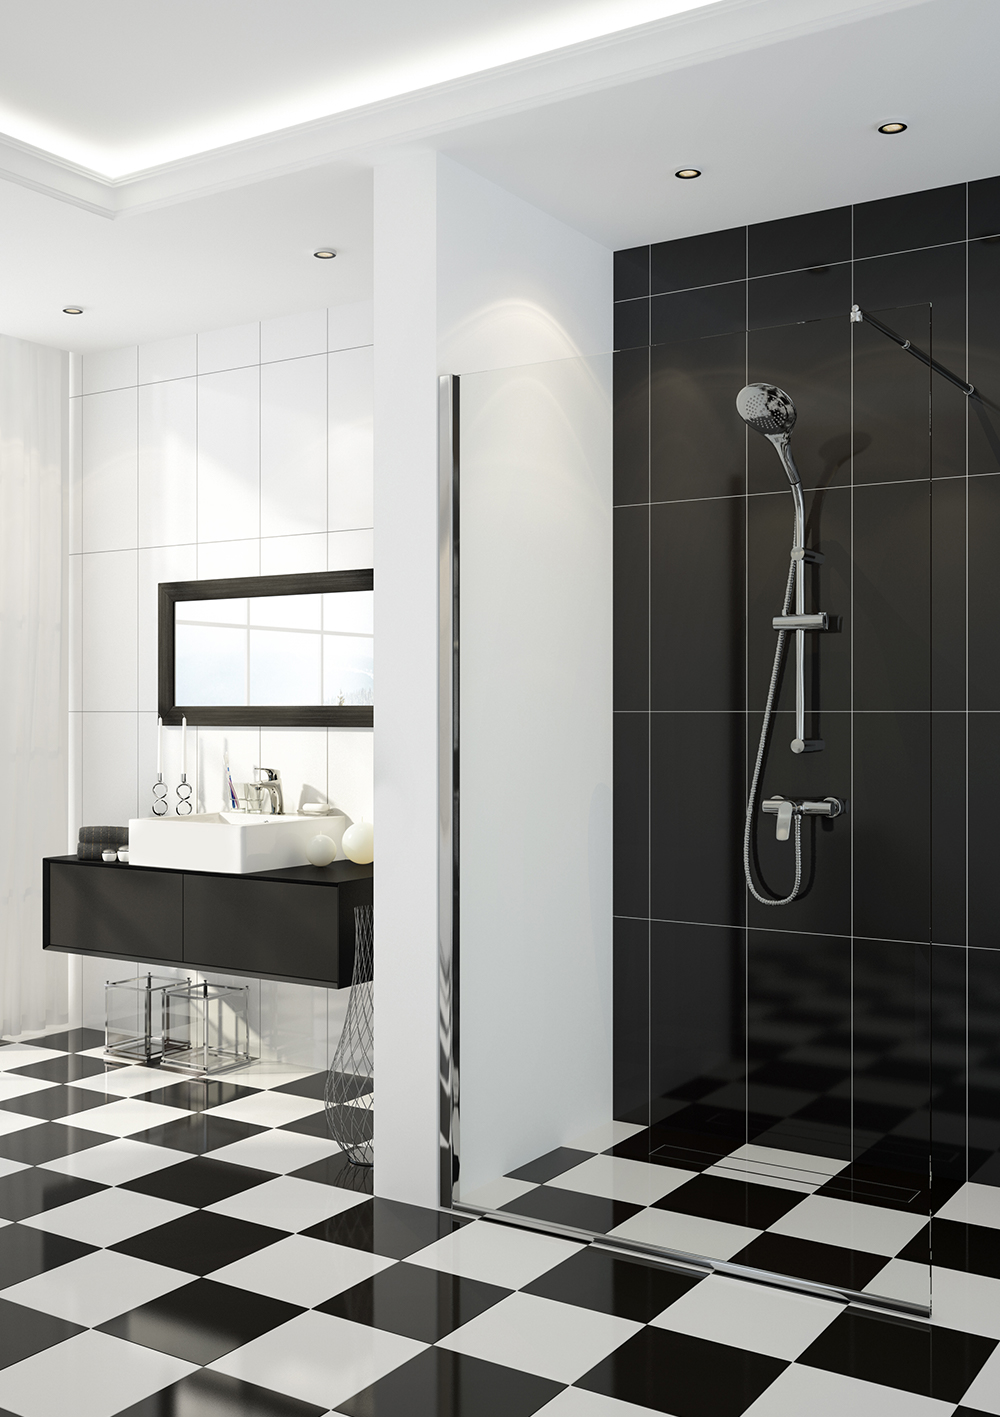 Kabina prysznicowa walk-in, seria: Abelia